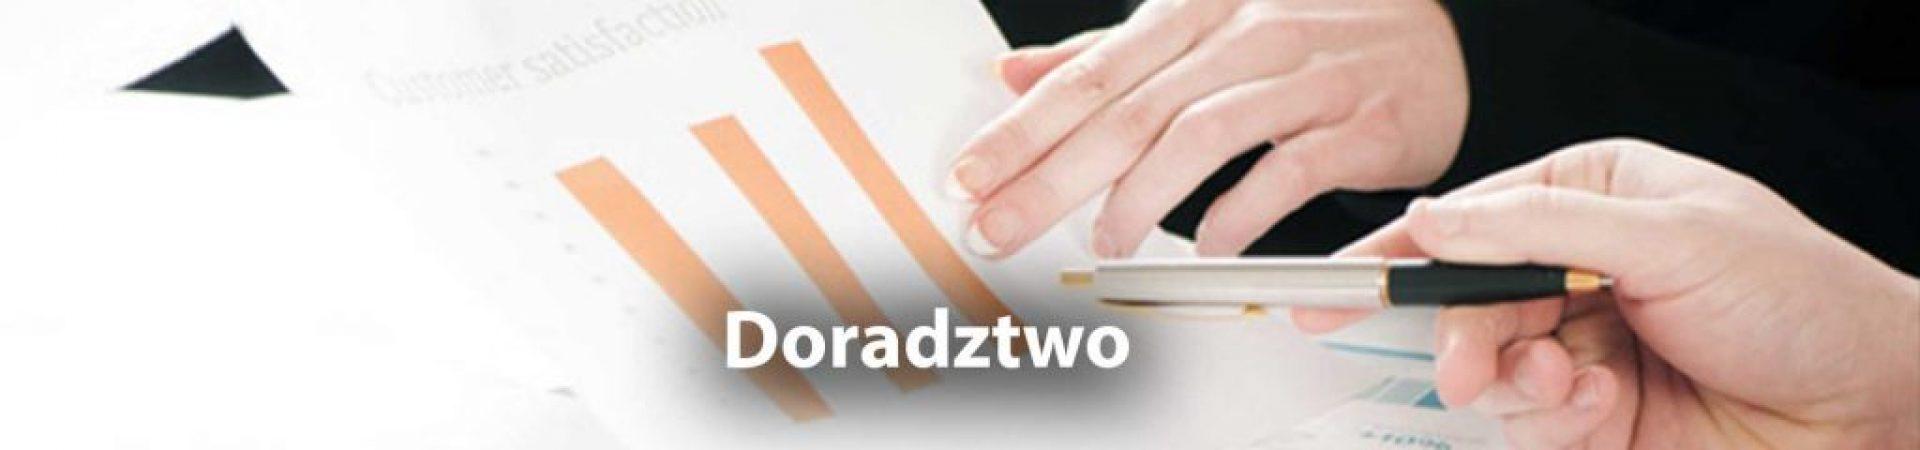 doradztwo-sl